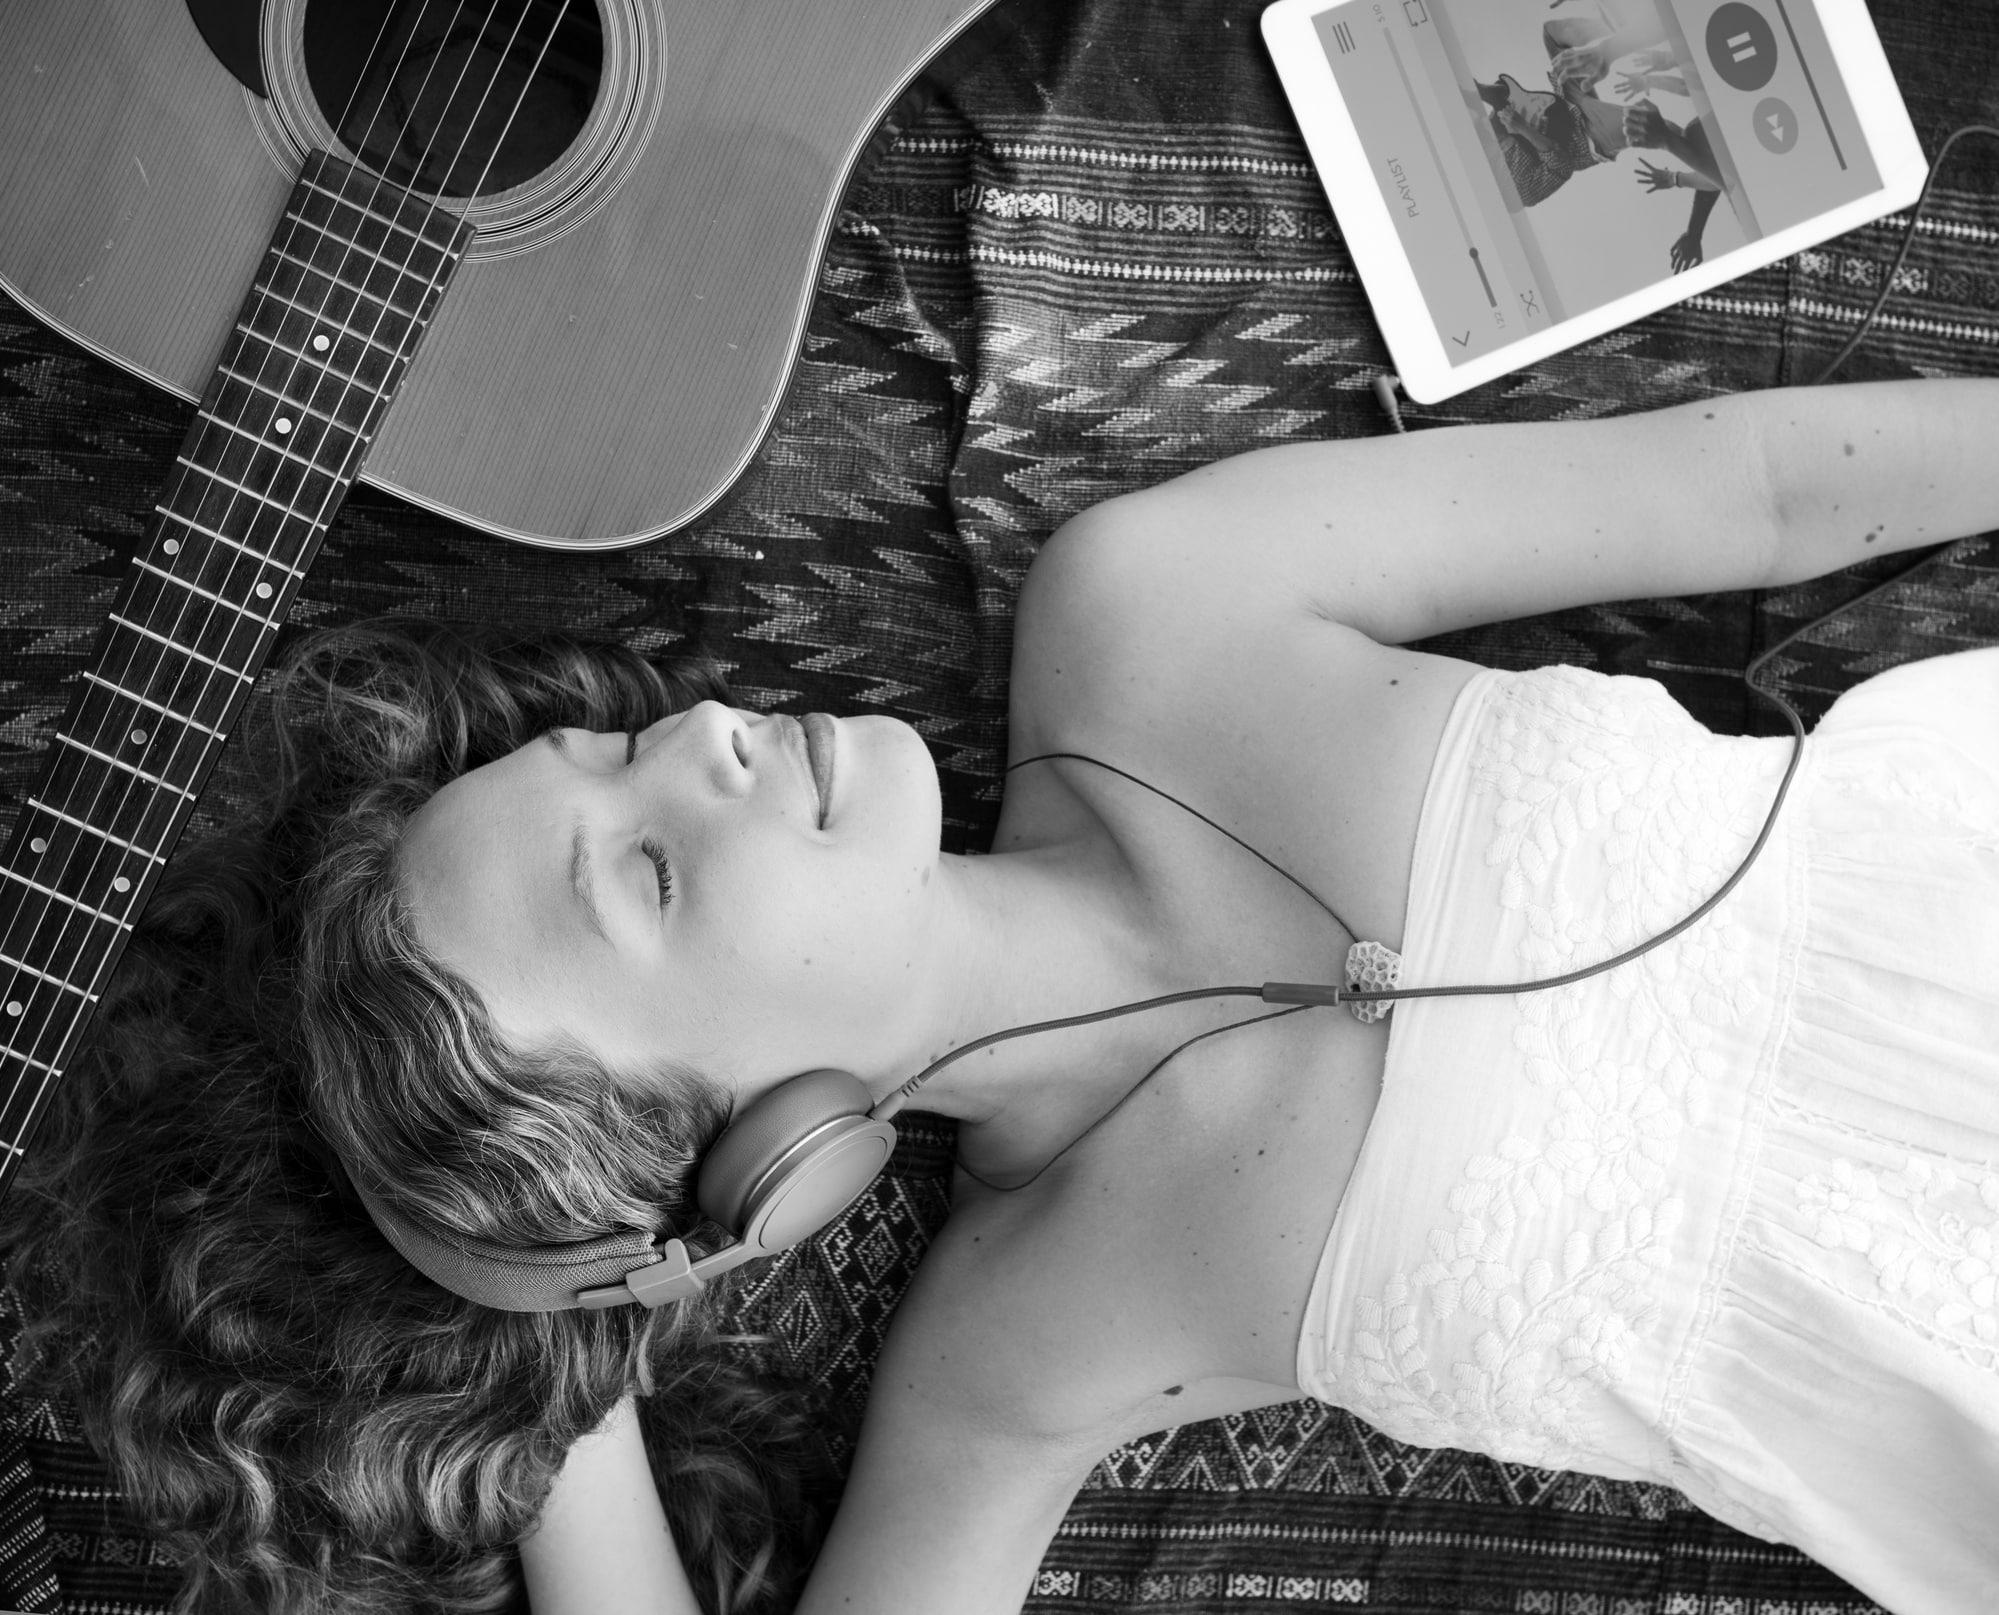 Playing music through her headphones while asleep